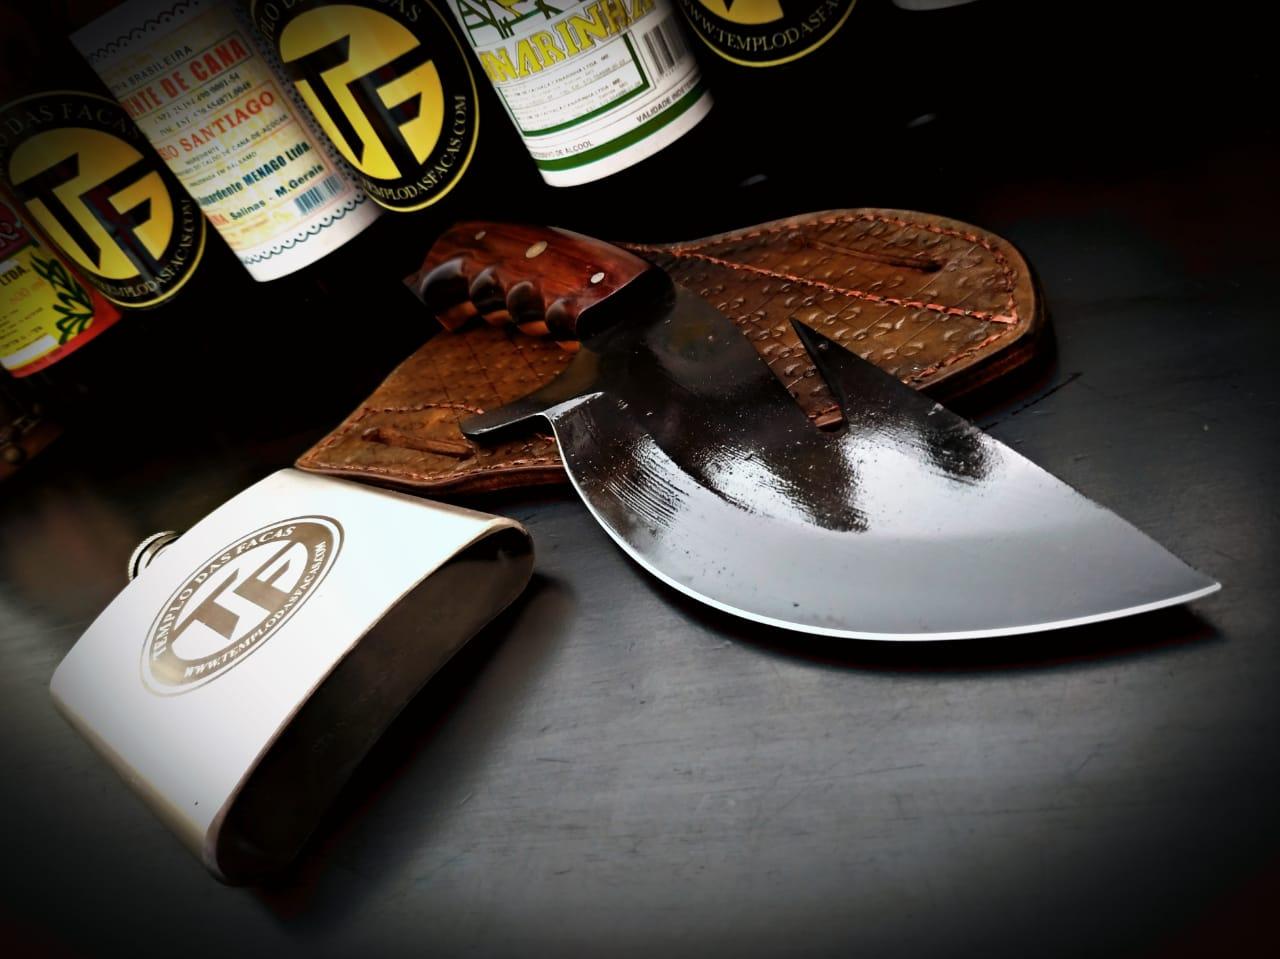 Faca artesanal coreadeira forjada verraco wood griping